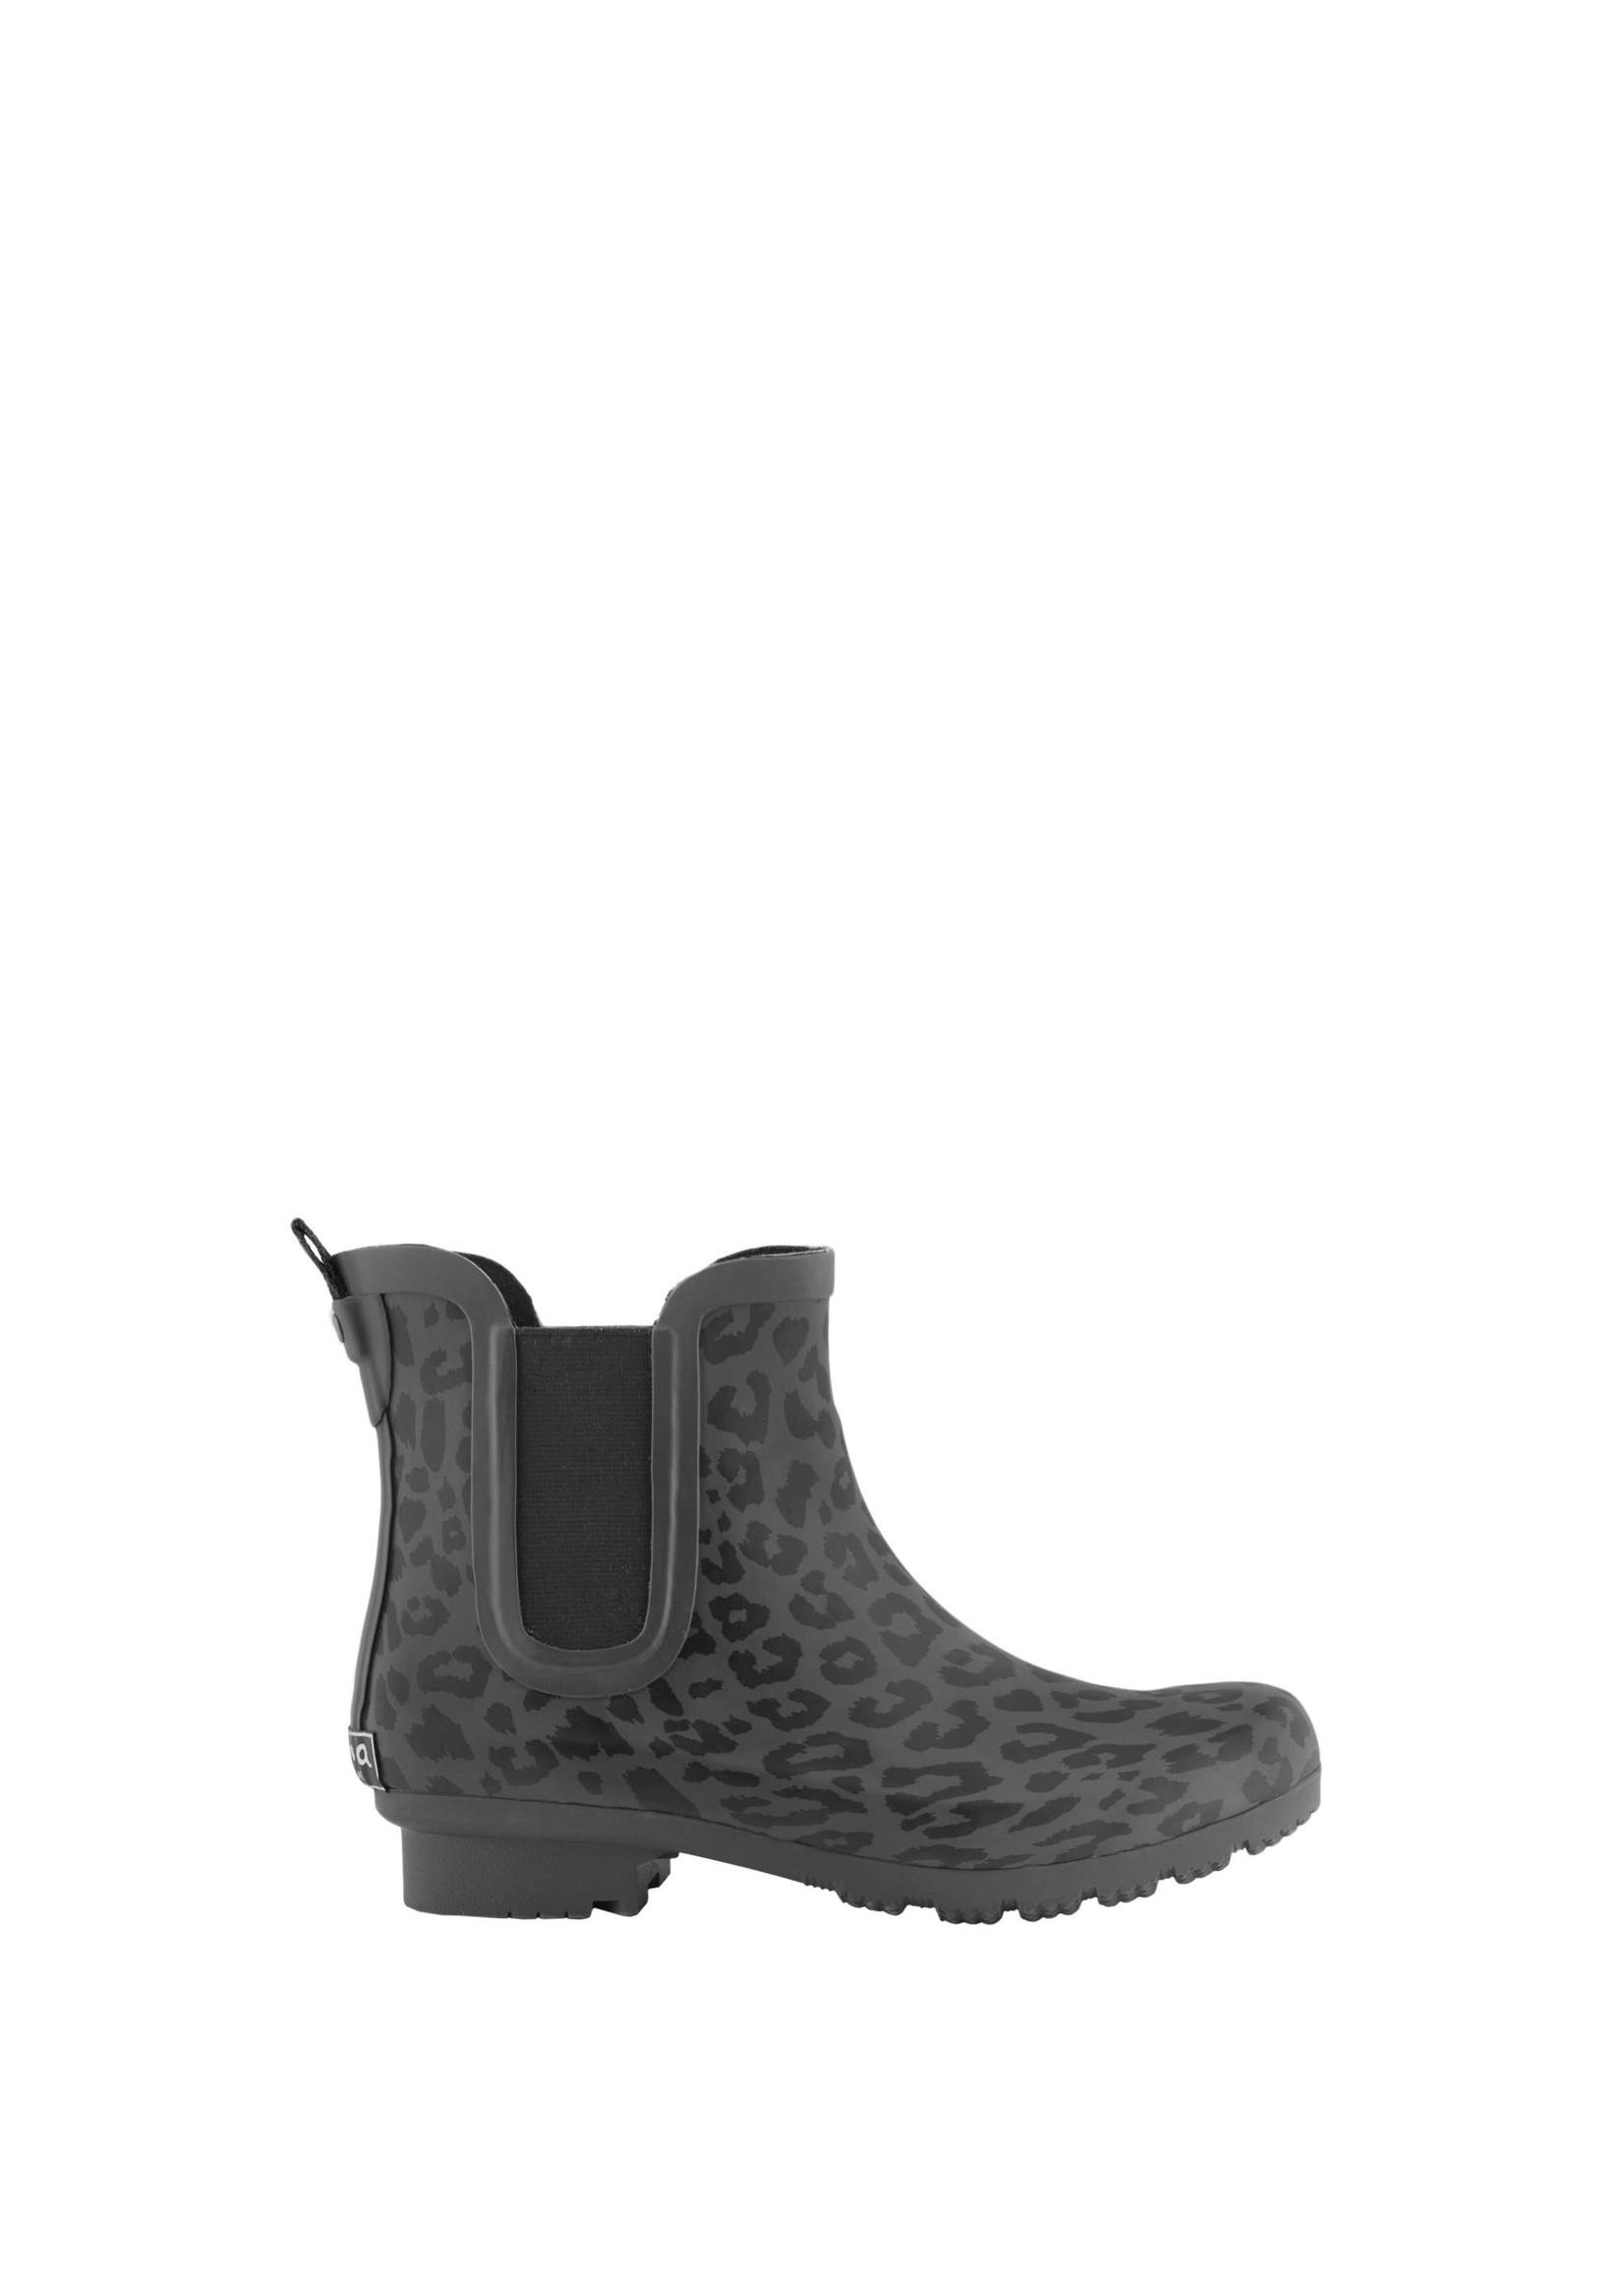 Roma Boots Rain Boots Chelsea